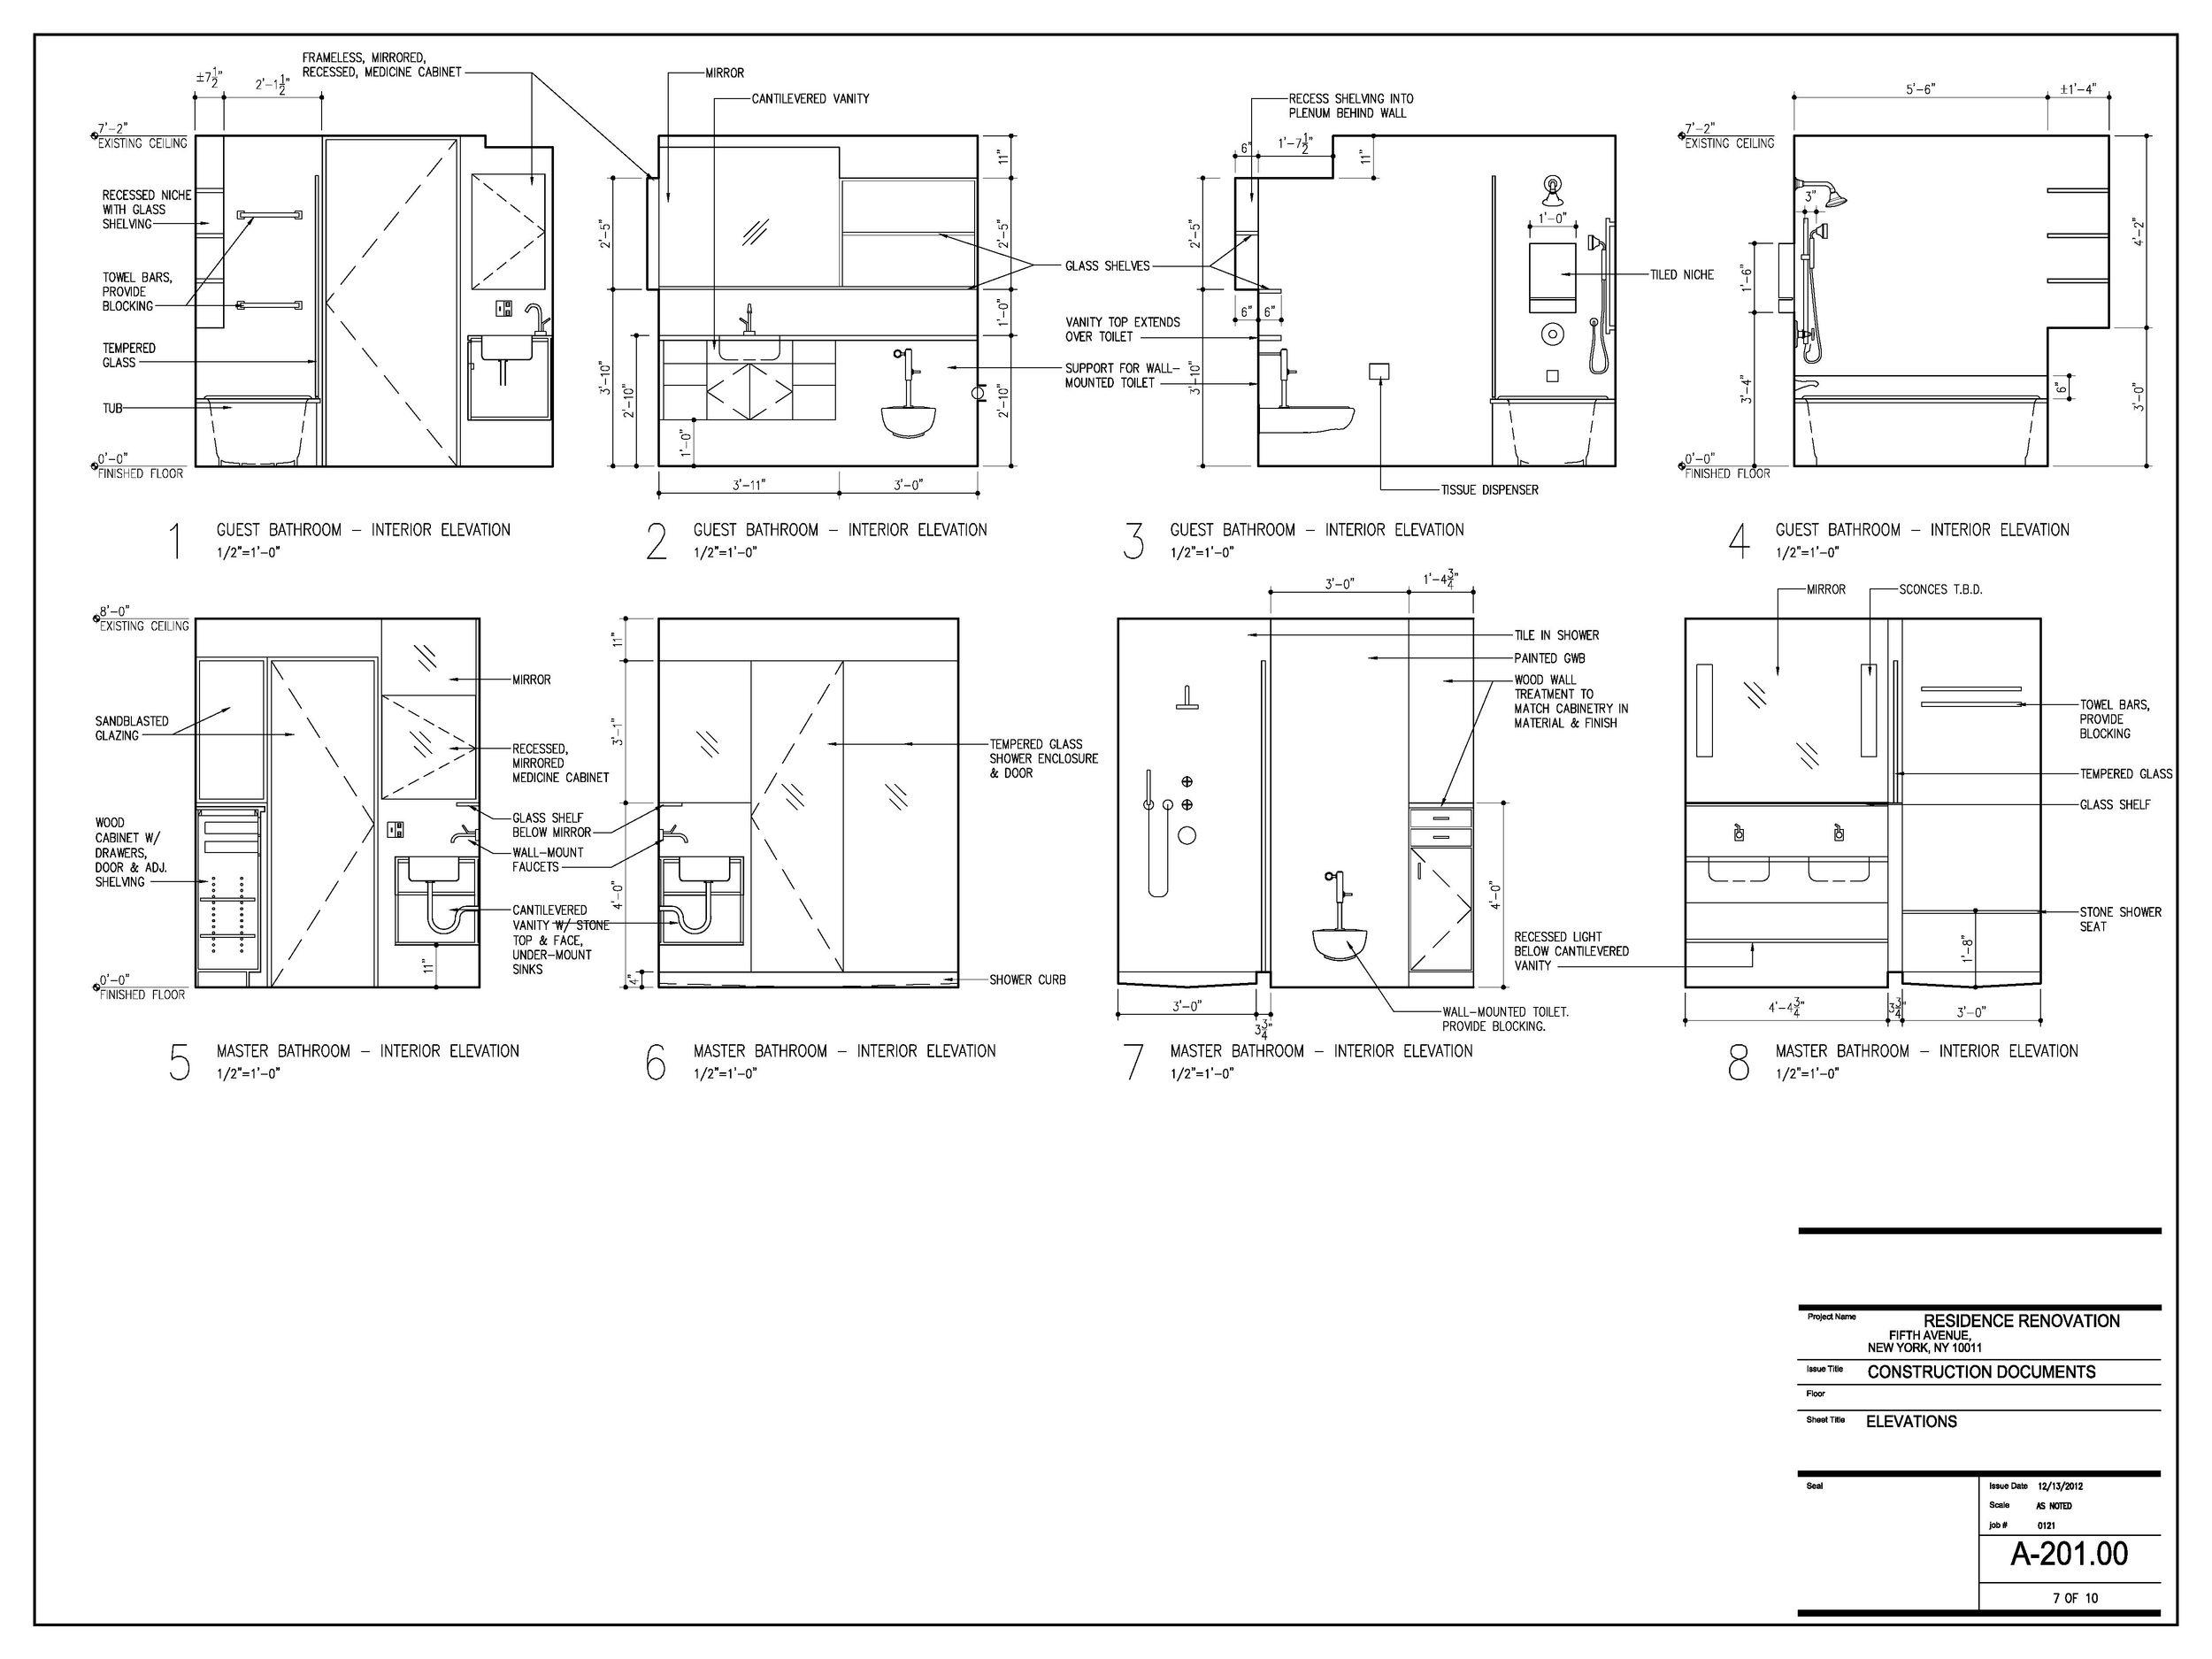 121-Gildin Elevs_2012-12-13_Page_1.jpg